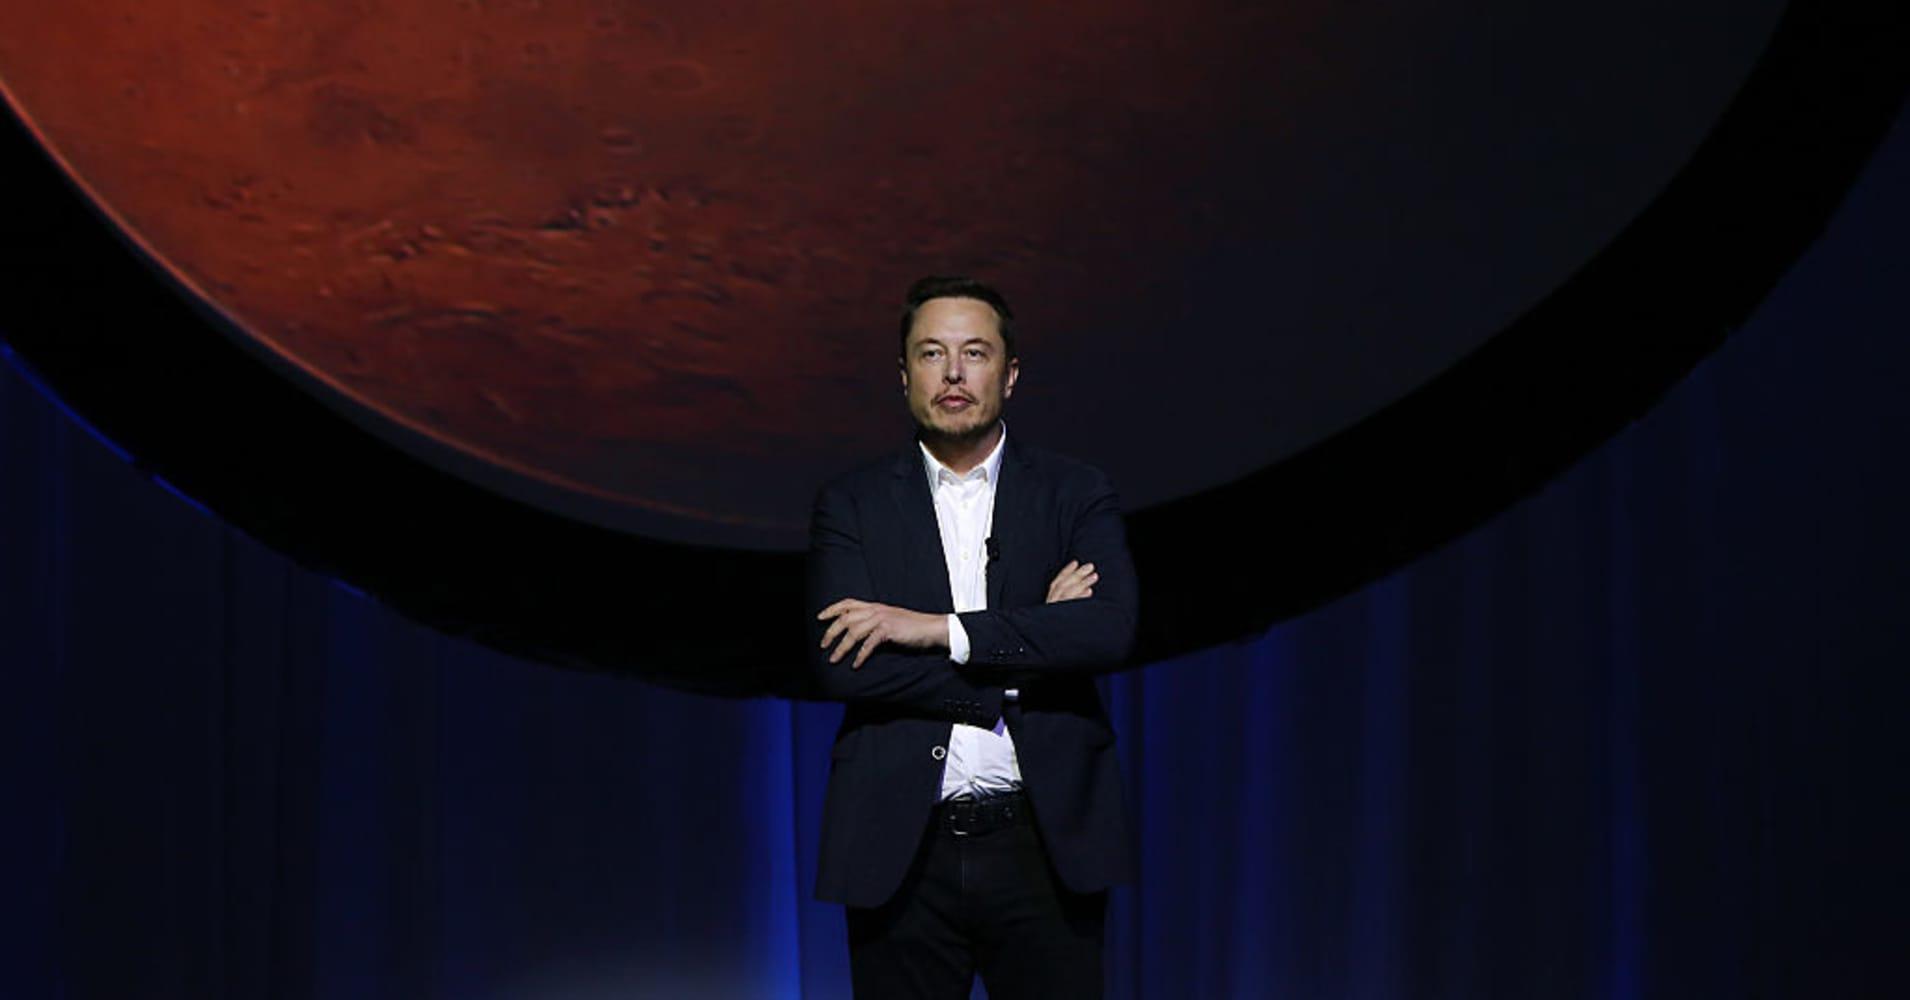 Tech entrepreneur Elon Musk at the 67th International Astronautical Congress in Guadalajara, Mexico, on Sept. 27, 2016.